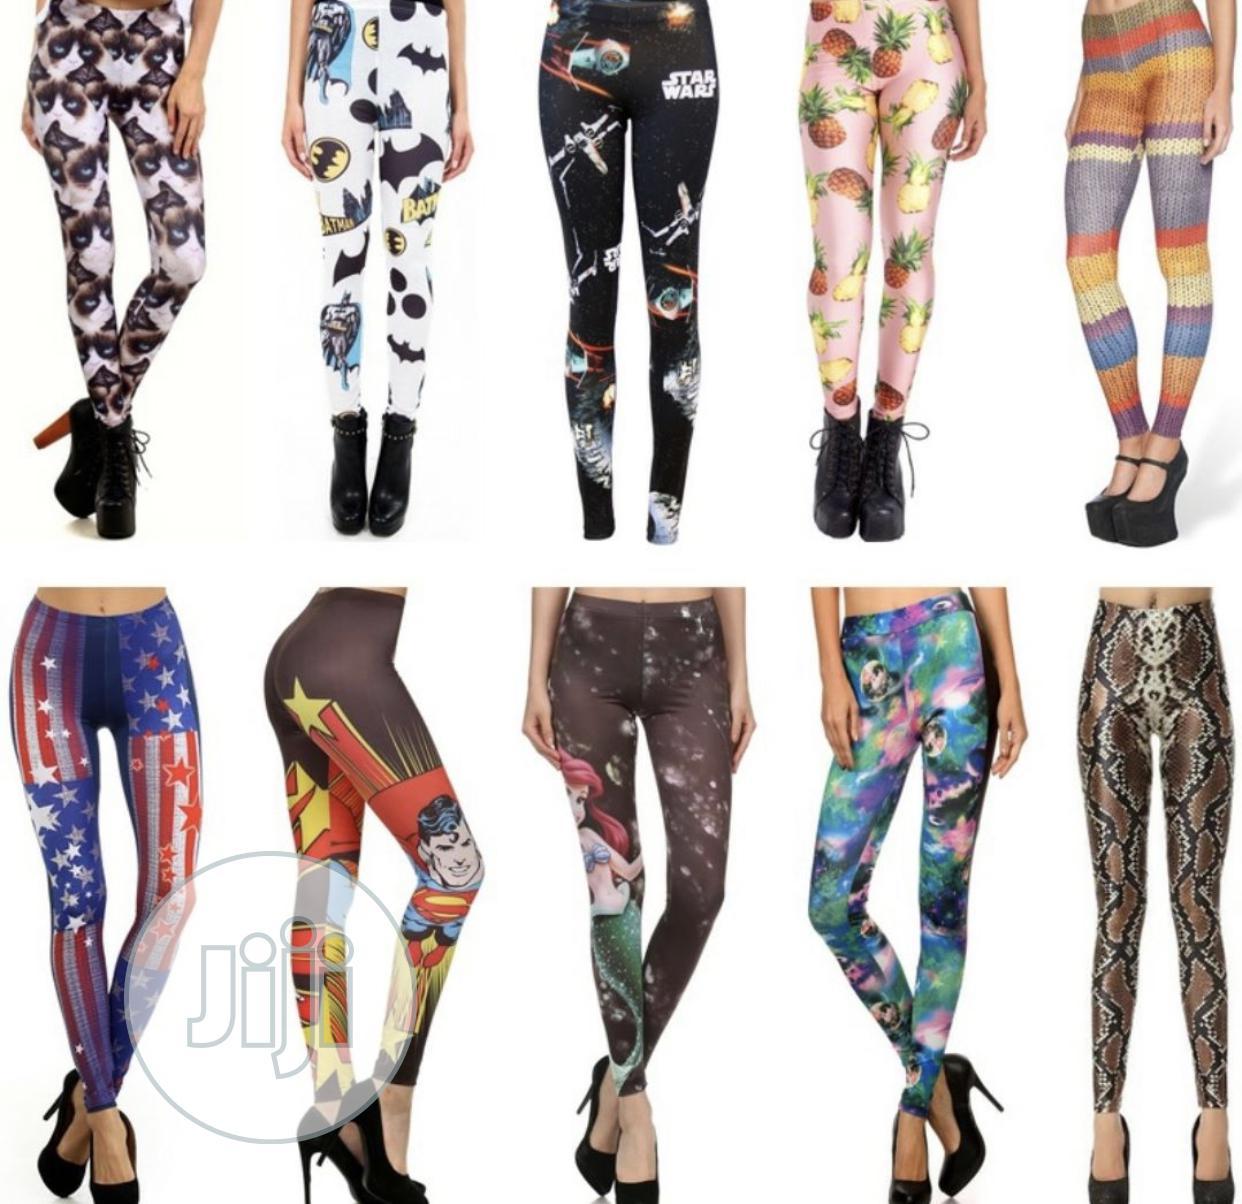 Trendy Vibrant Quality Leggings